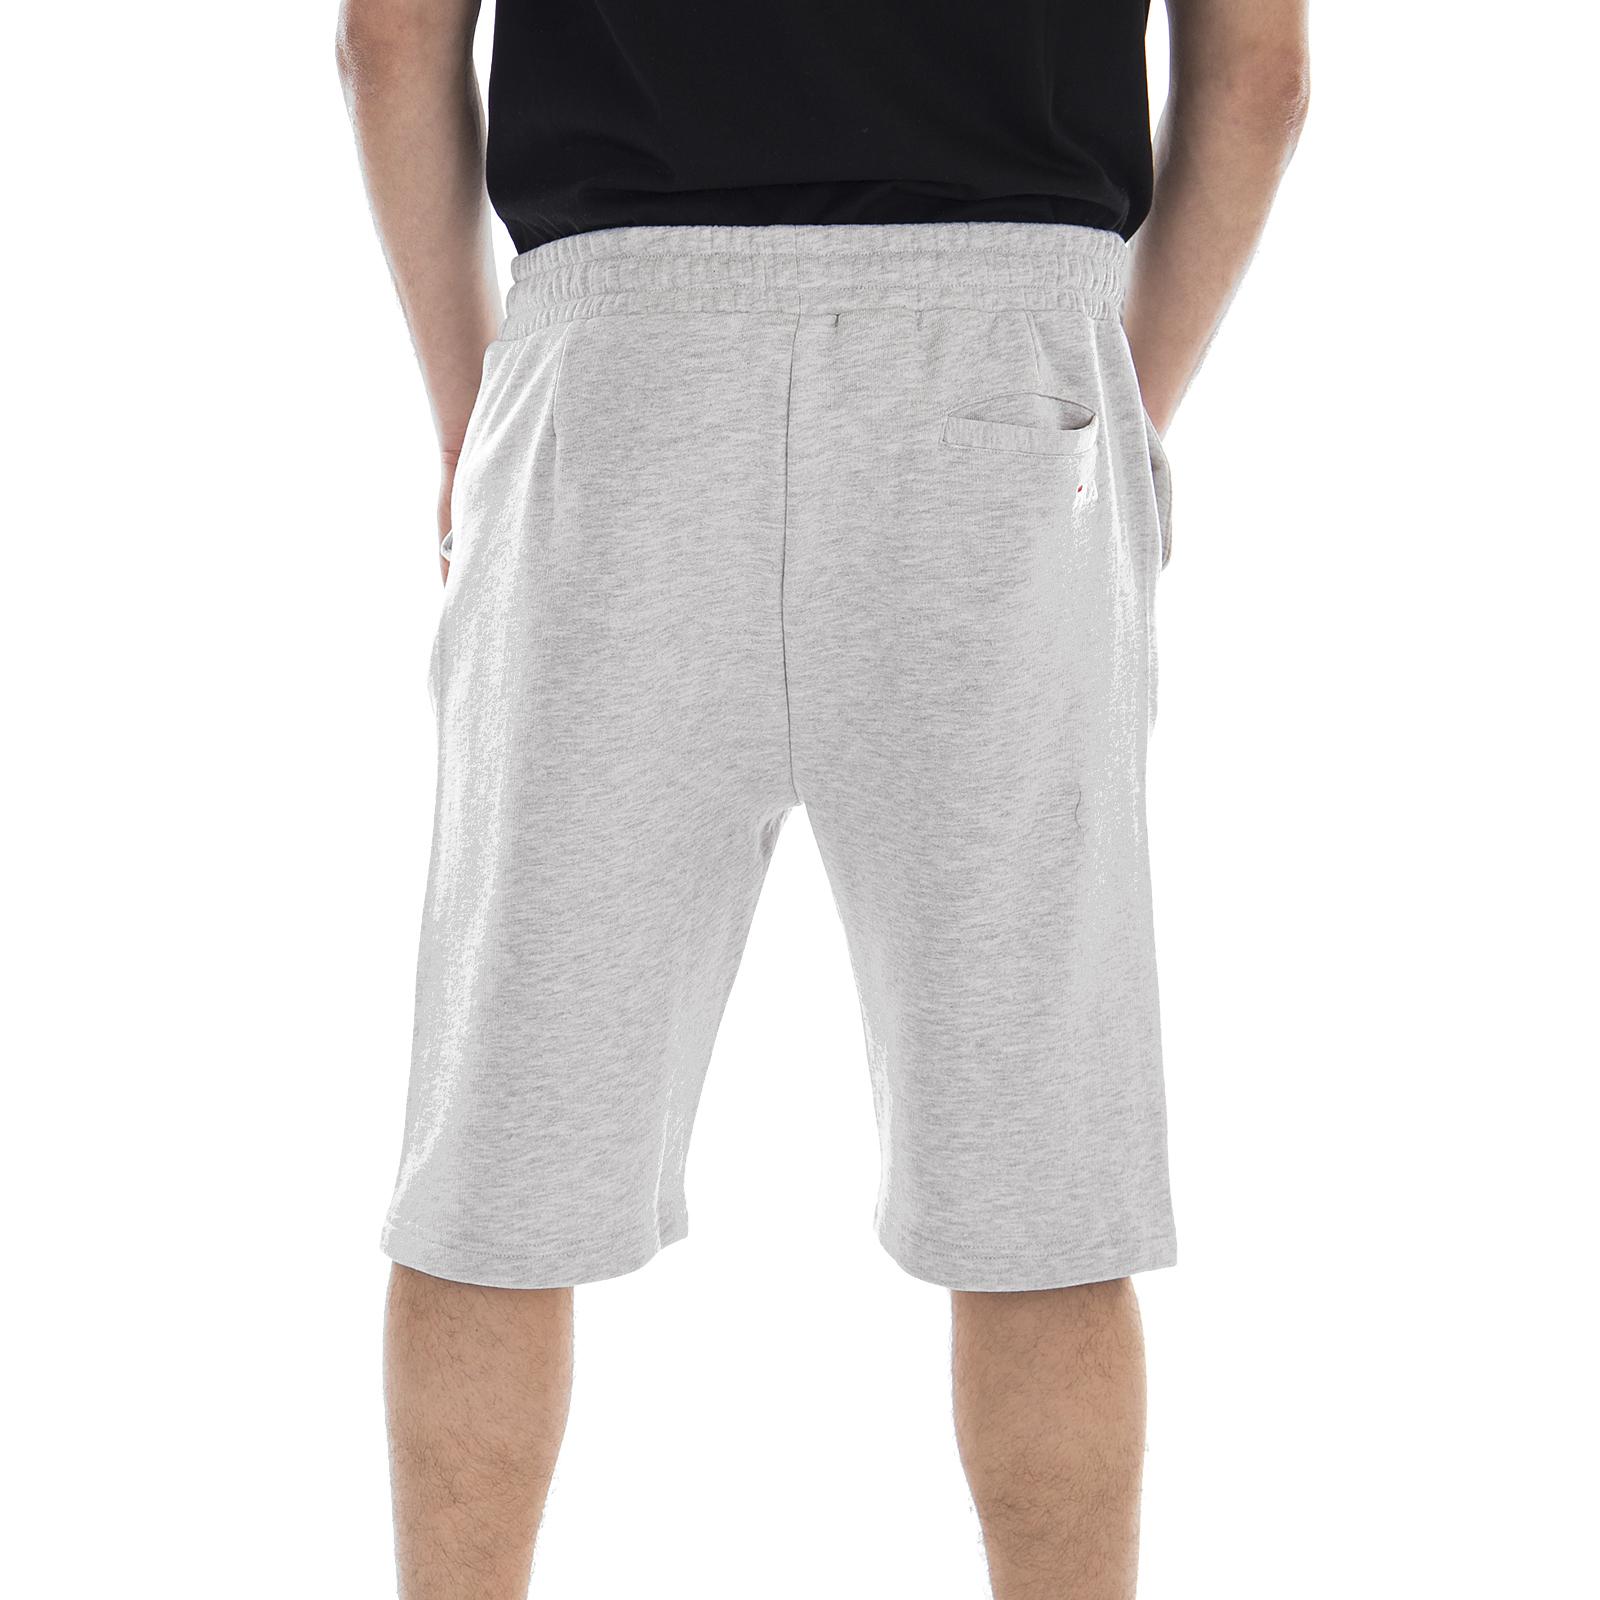 Sweat Long Melange Shorts Sweatshirts Fila Bros Cameron Lichtgrijs RAaZI1wq